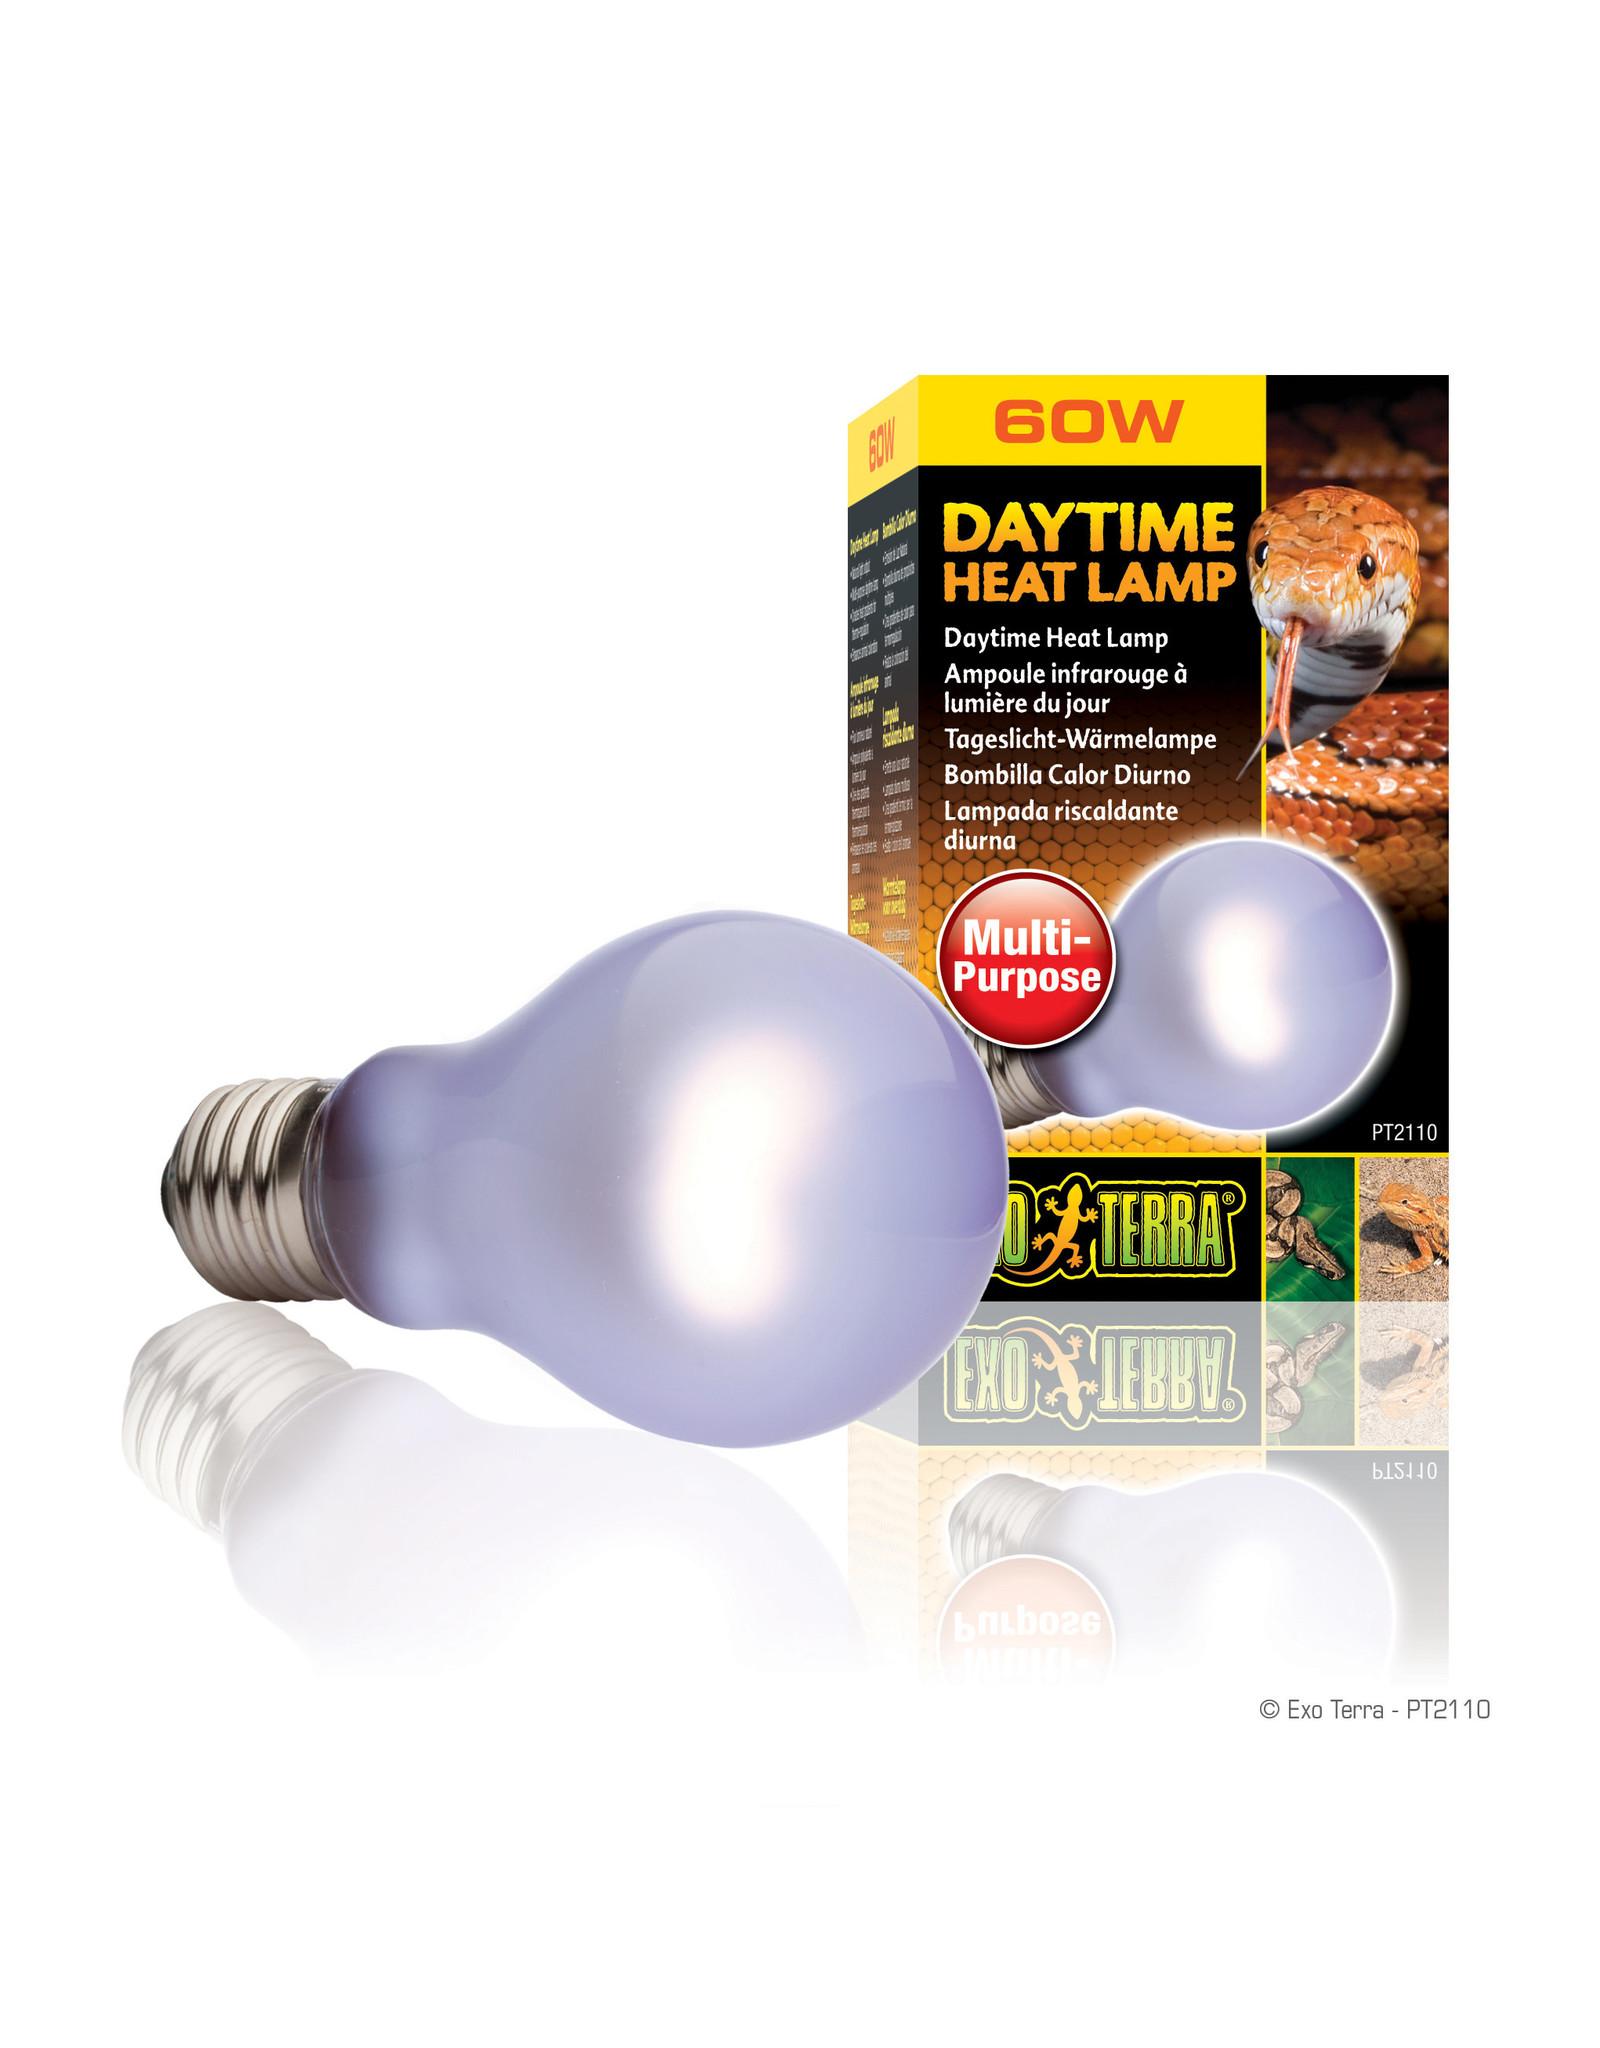 Exo Terra Daytime Heat Lamp A19/60W